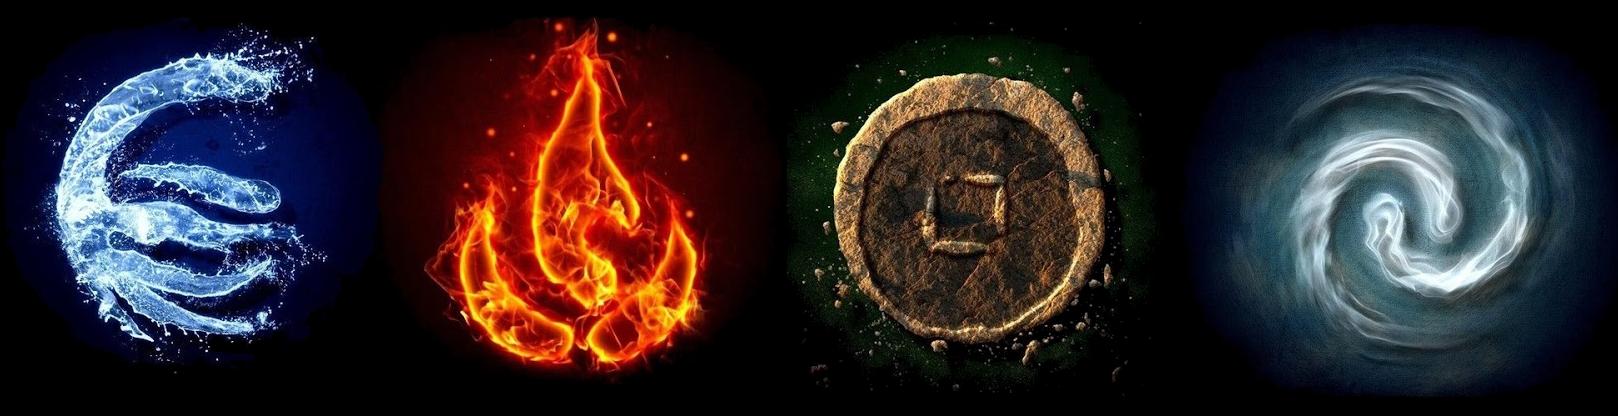 Avatars of four elements